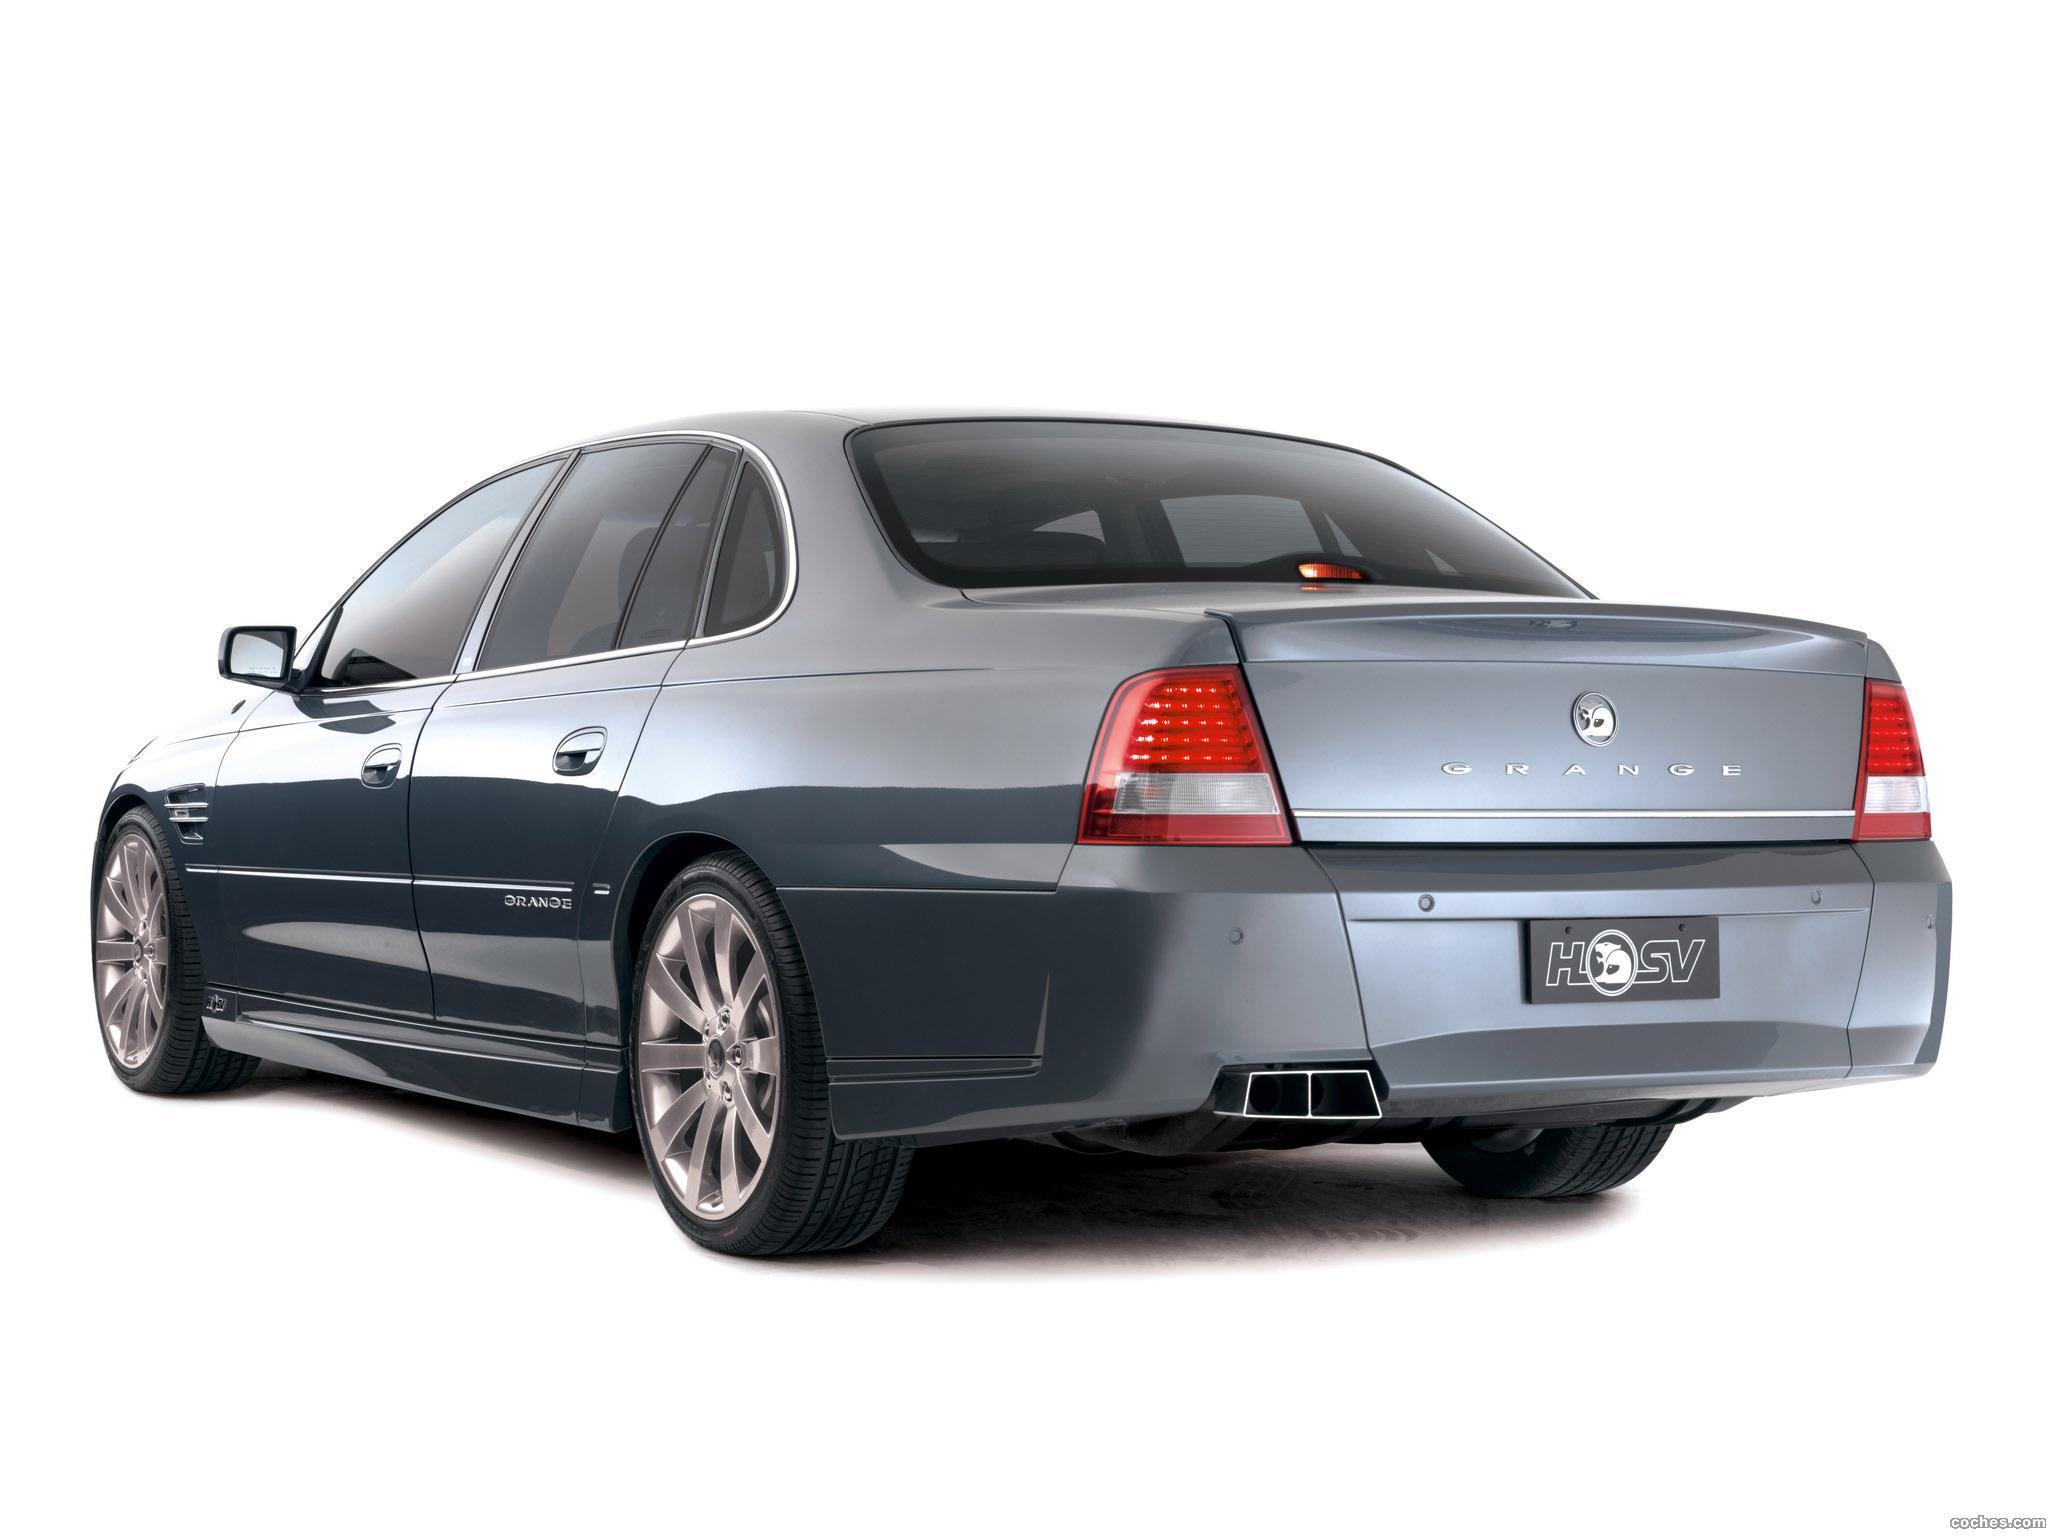 Foto 1 de Holden HSV Grange 2004